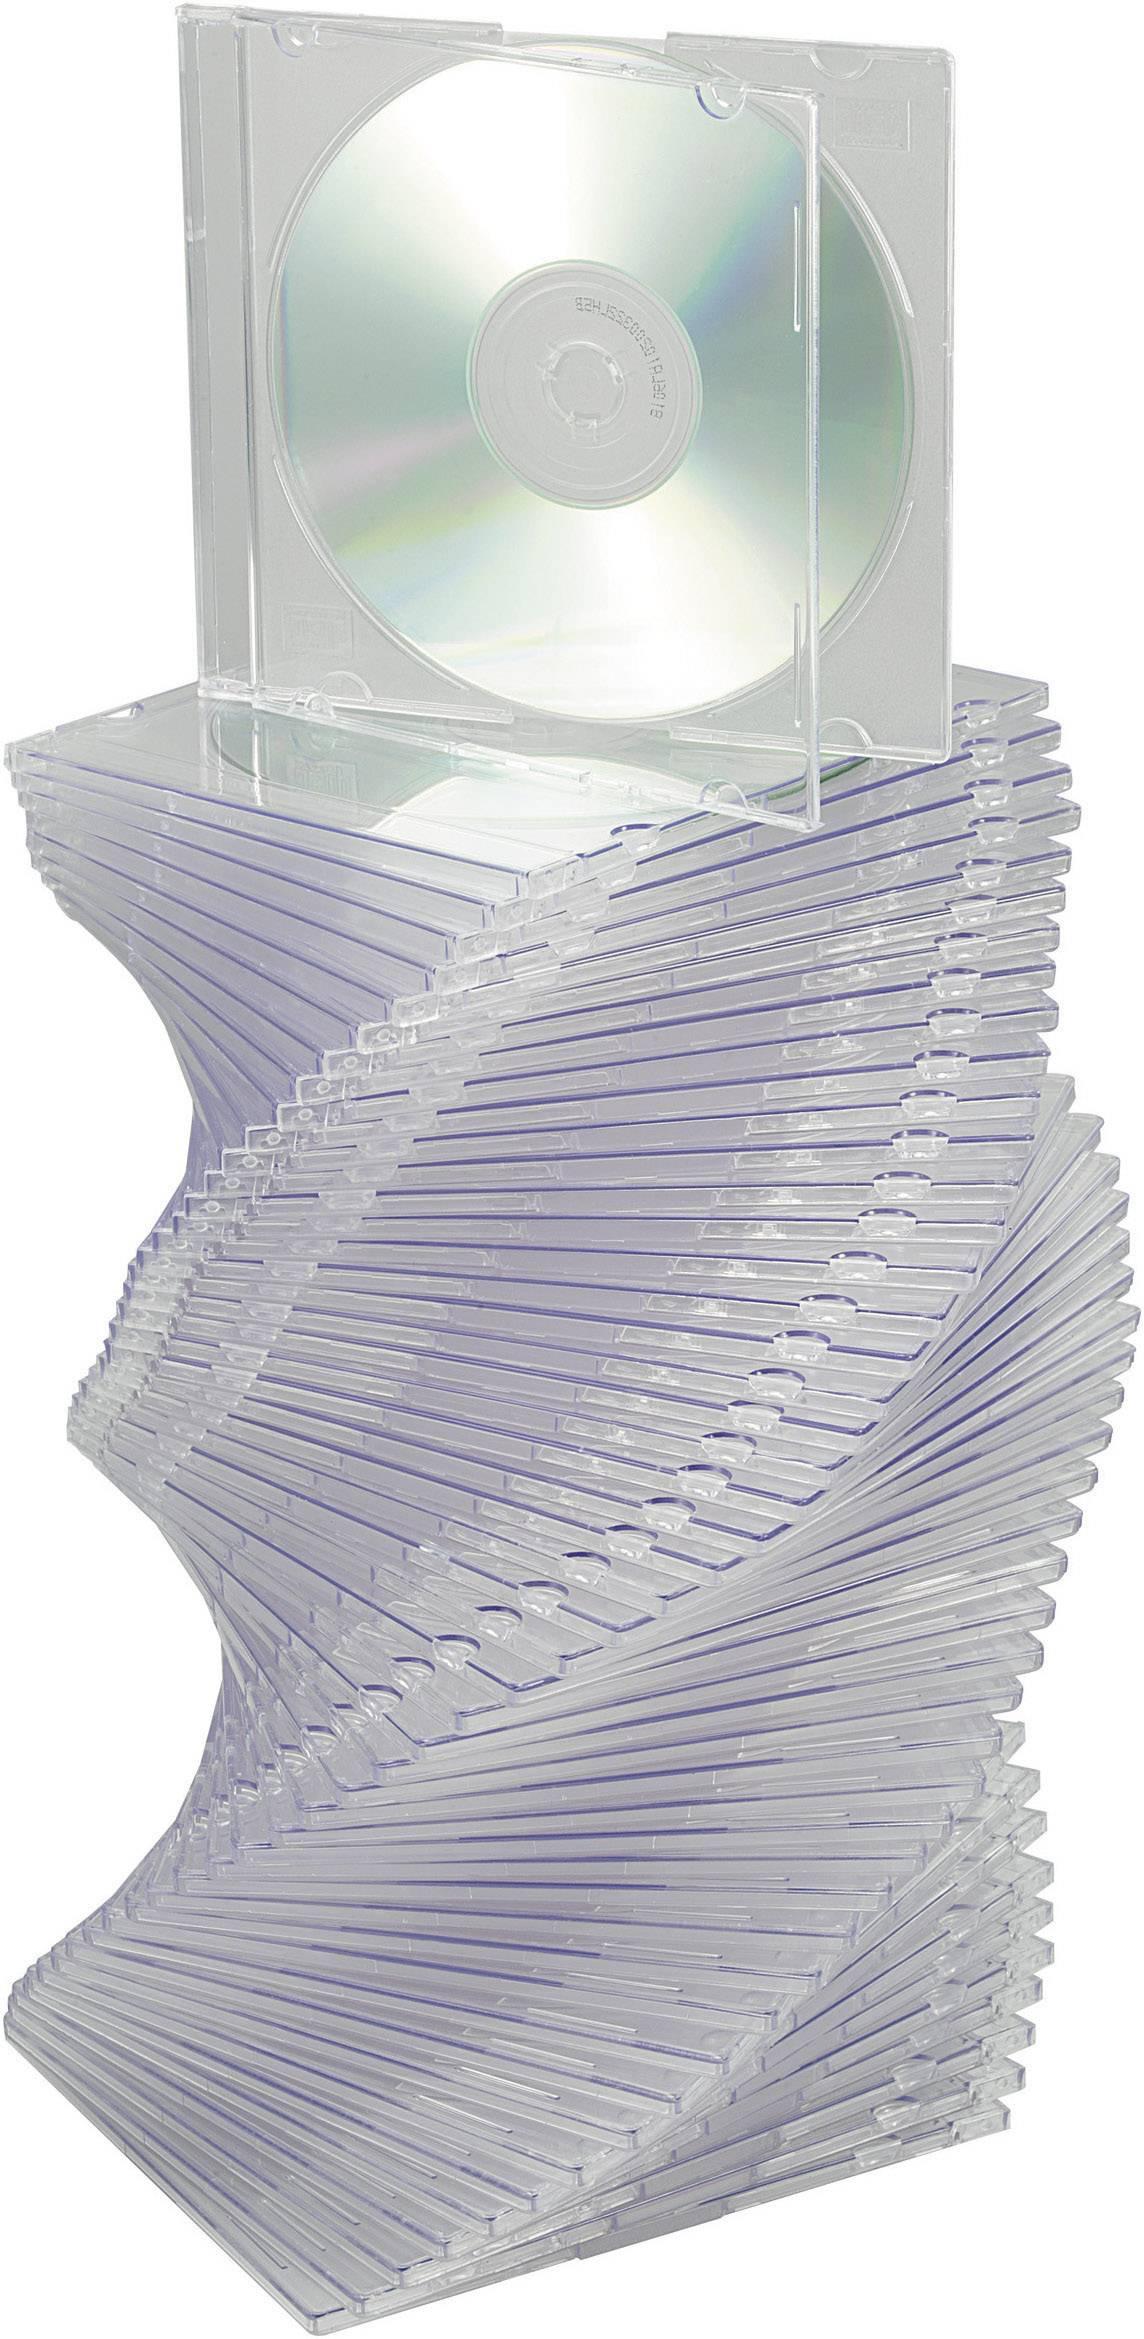 Krabičky Slim pro CD, 100 ks